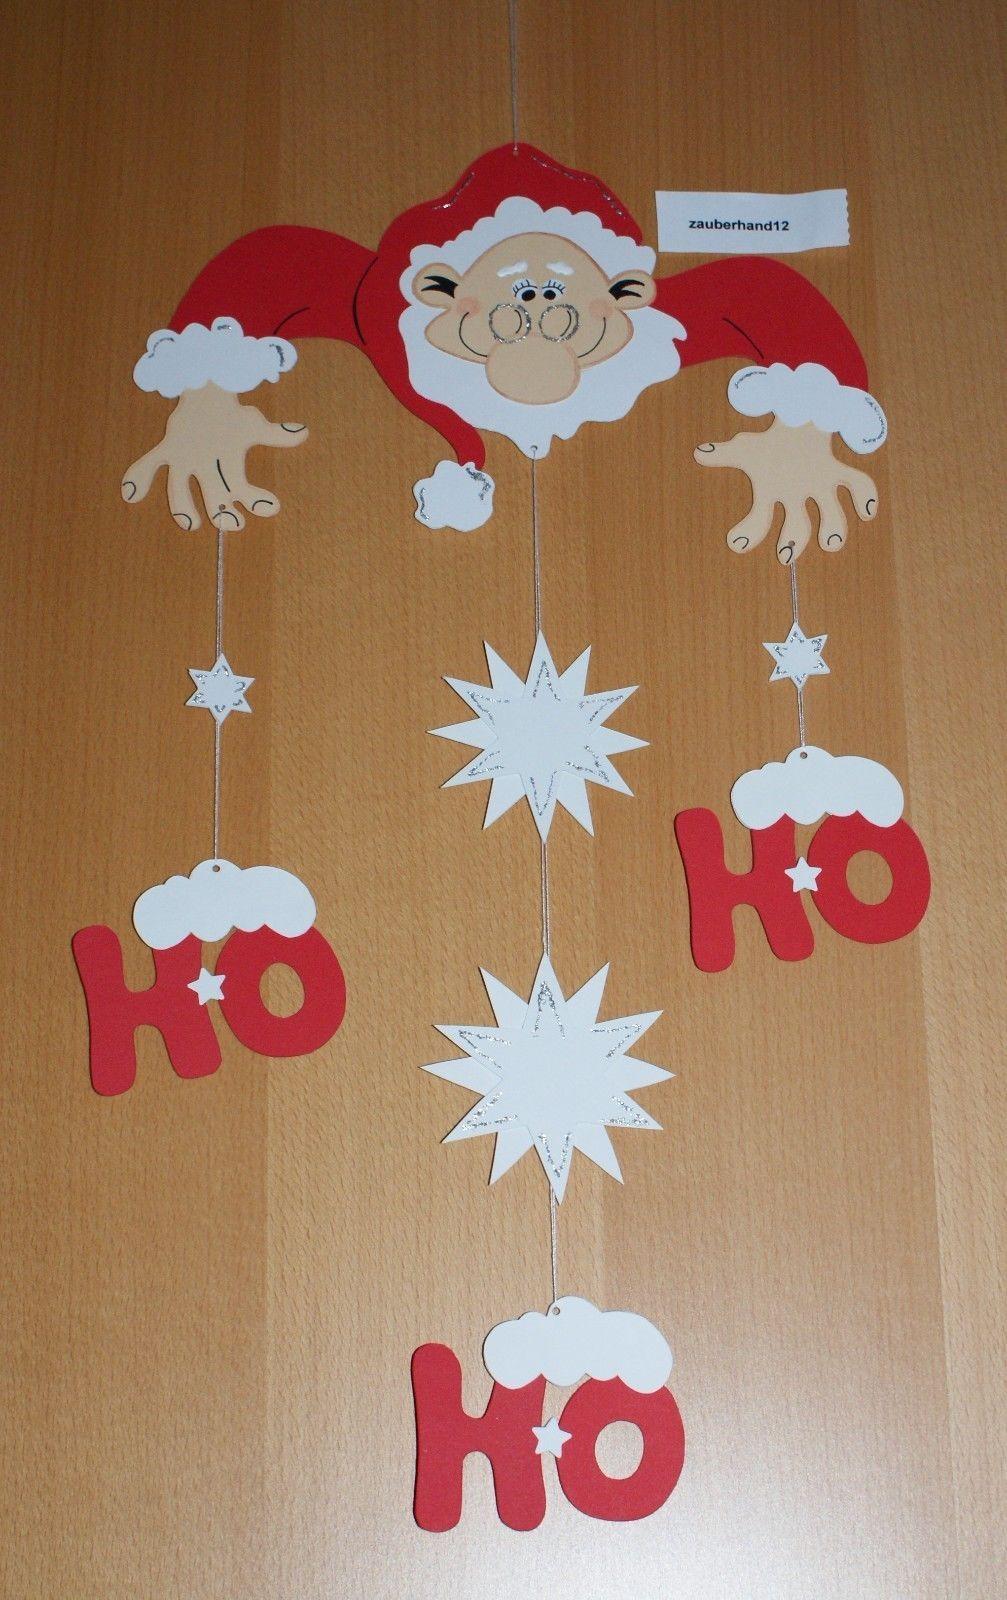 Fensterbild Weihnachtsmann Mobile Ho Ho Kette Tonkarton Deko Weihnachten Winter For Sale Eur 4 50 See Photos Basteln Weihnachten Basteln Weihnachtsbasteln